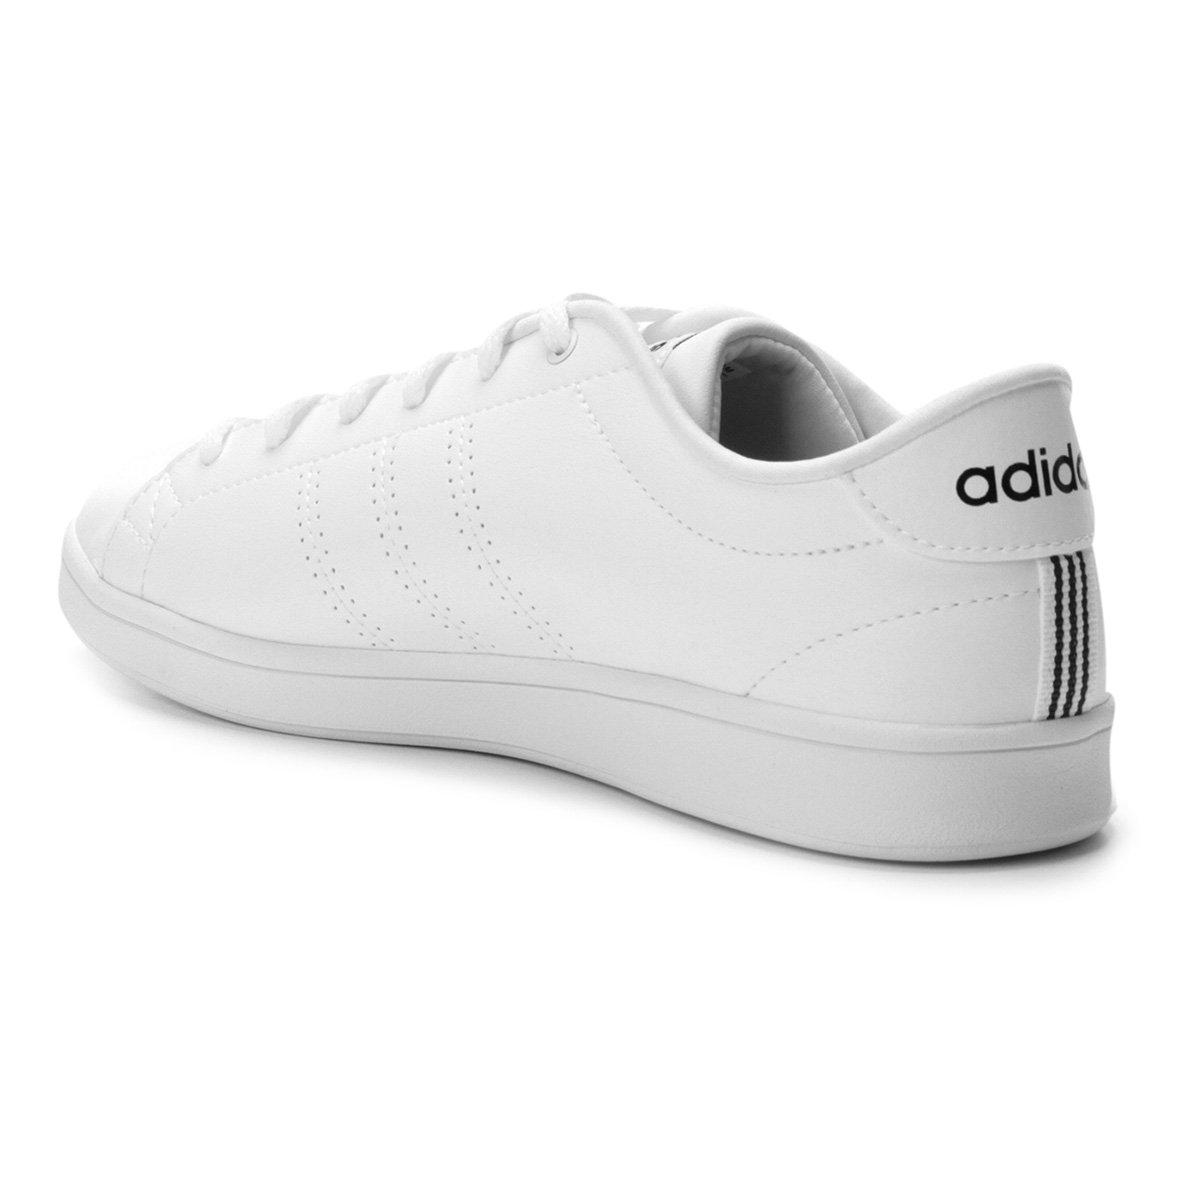 49ac0df2ba ... Tênis Adidas Advantage Clean Qt Feminino - Branco e Preto - Compre .